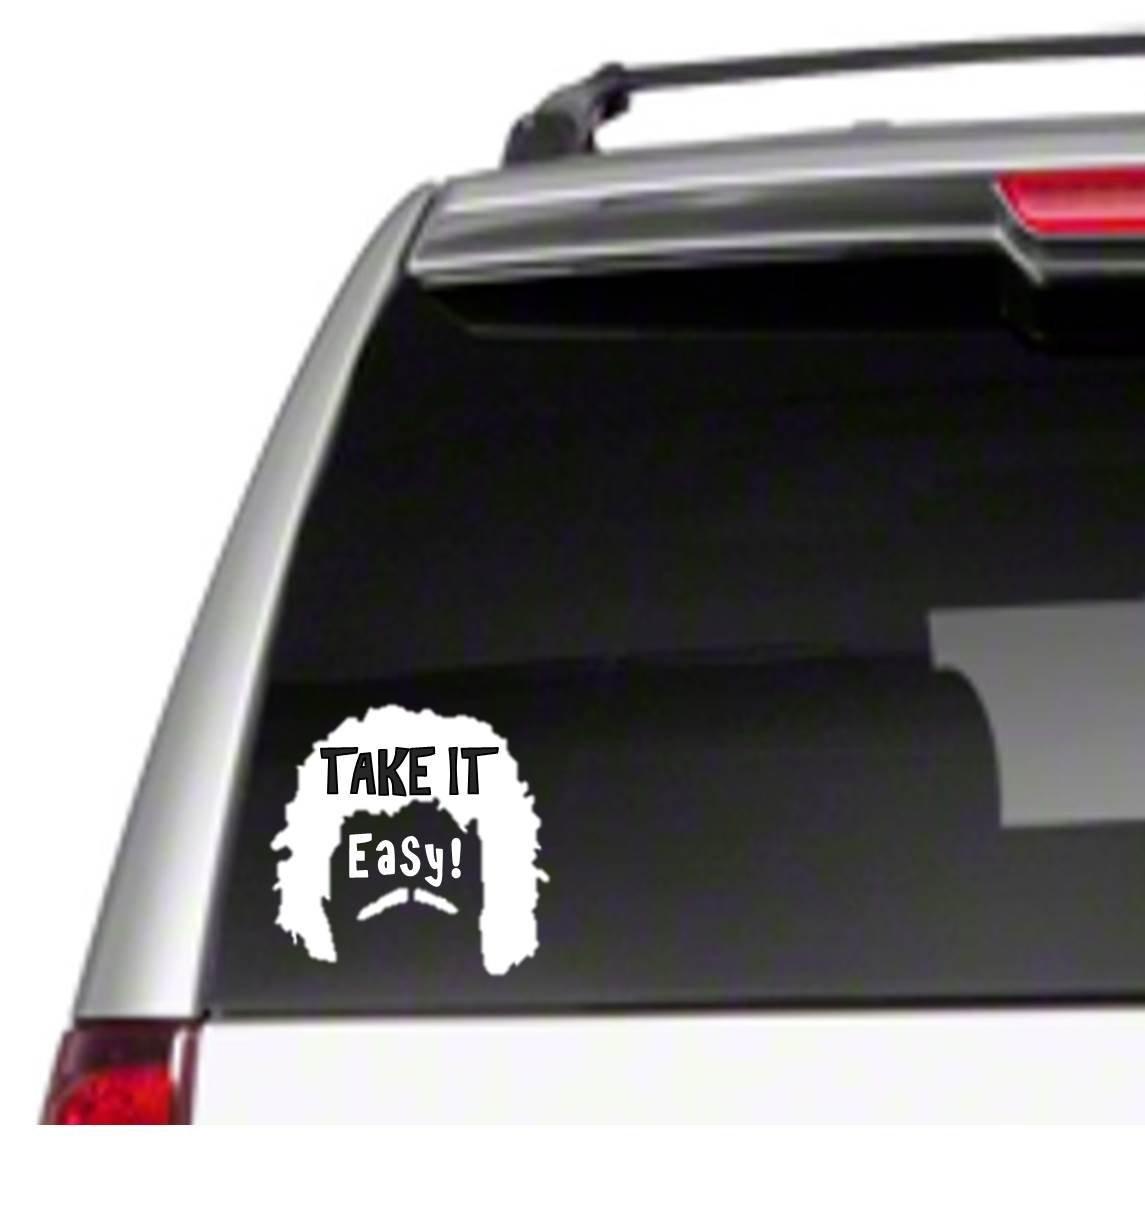 Take it Easy Car Vinyl Sticker Decal 6 nacho libre jack black funny movie *I4* Decal Frog